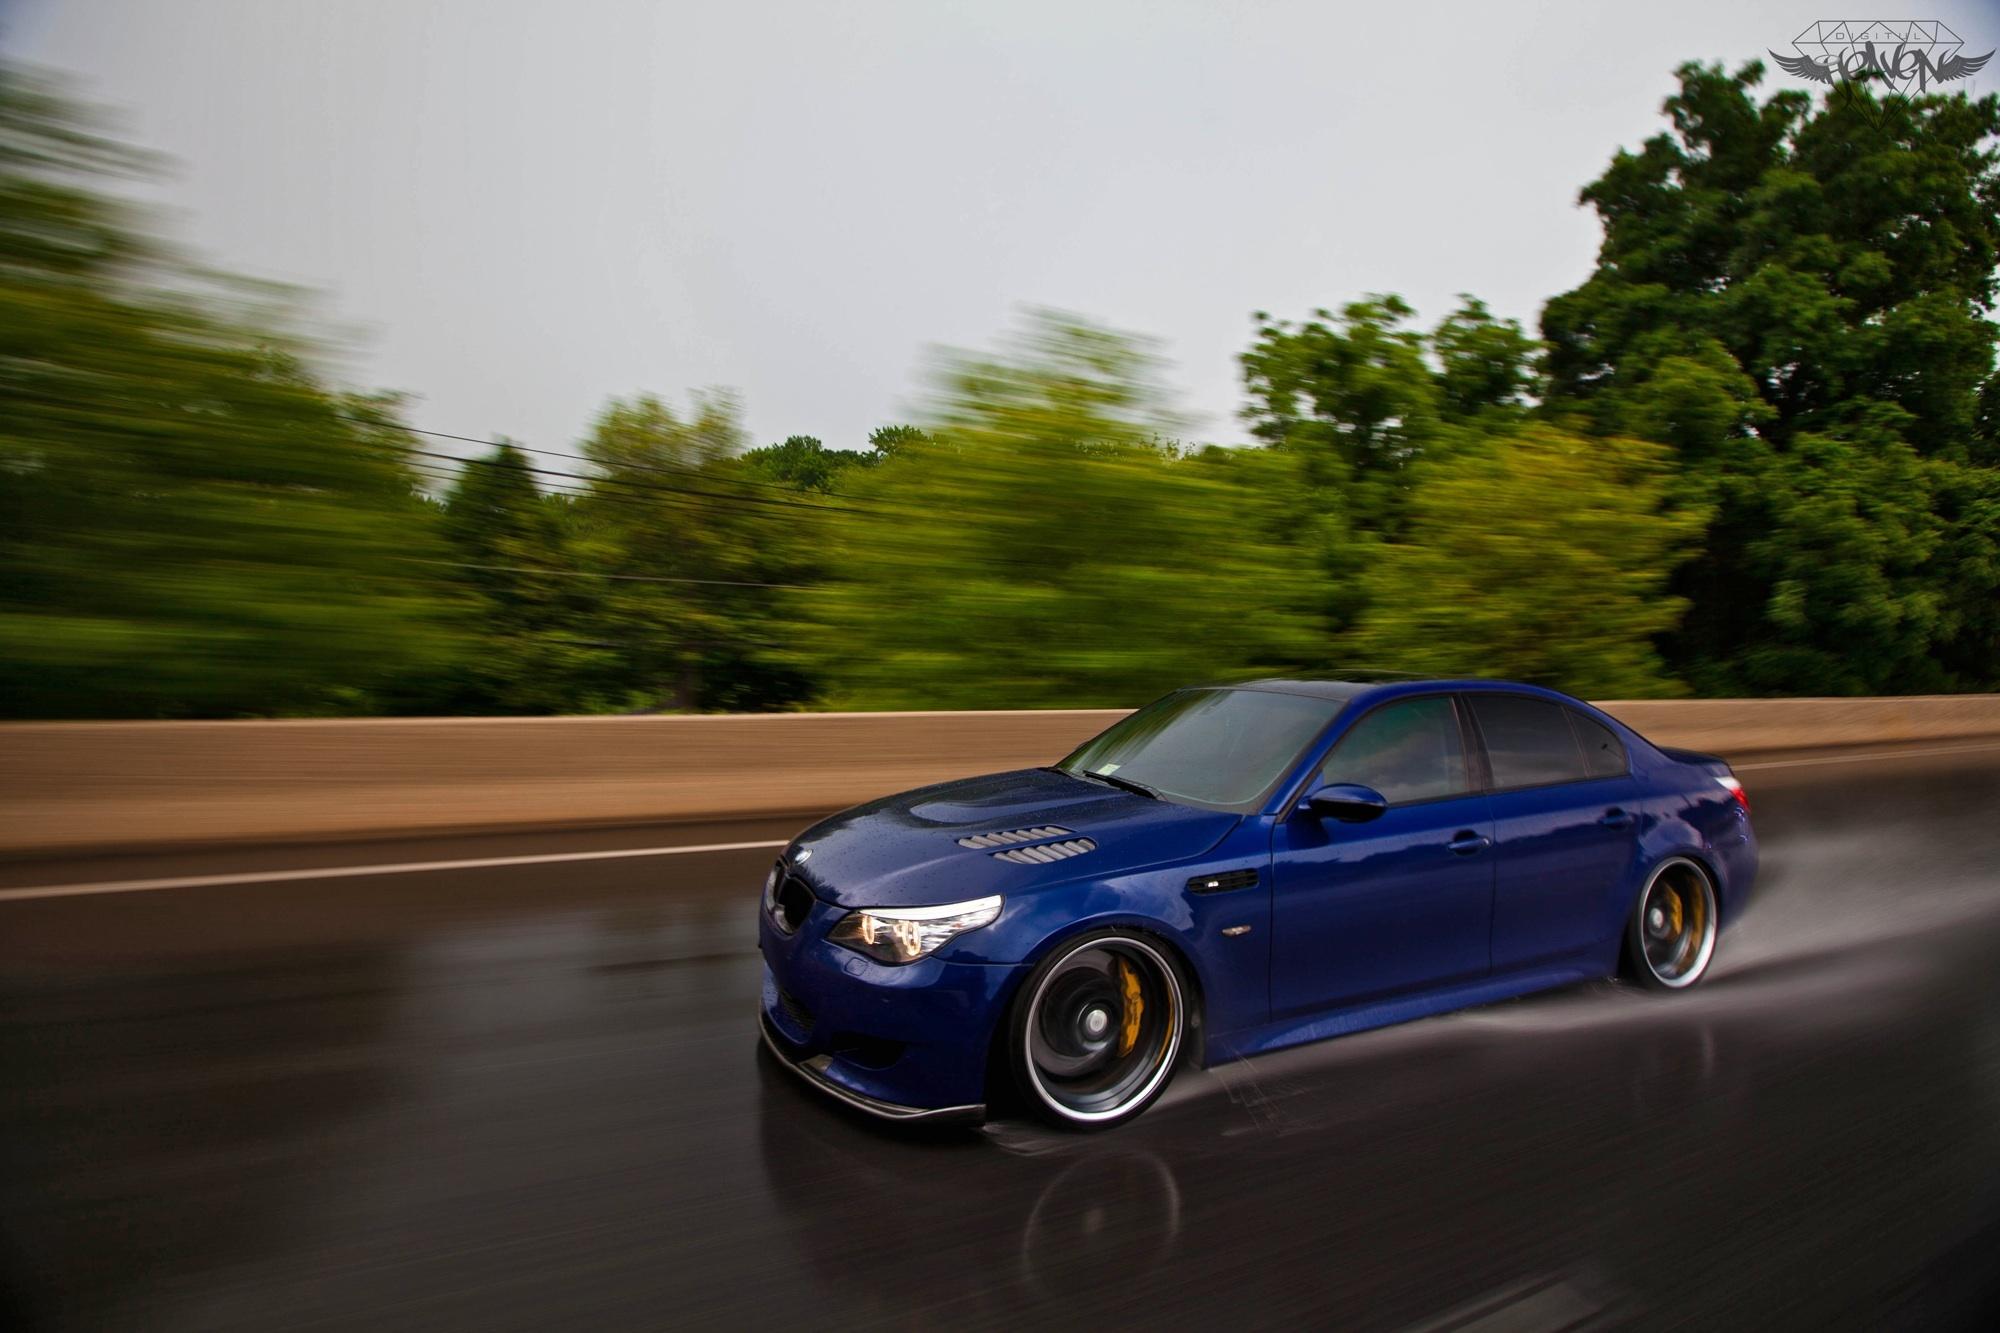 2006 Interlagos blue BMW M5 E60 Pictures Mods Upgrades Wallpaper 2000x1333